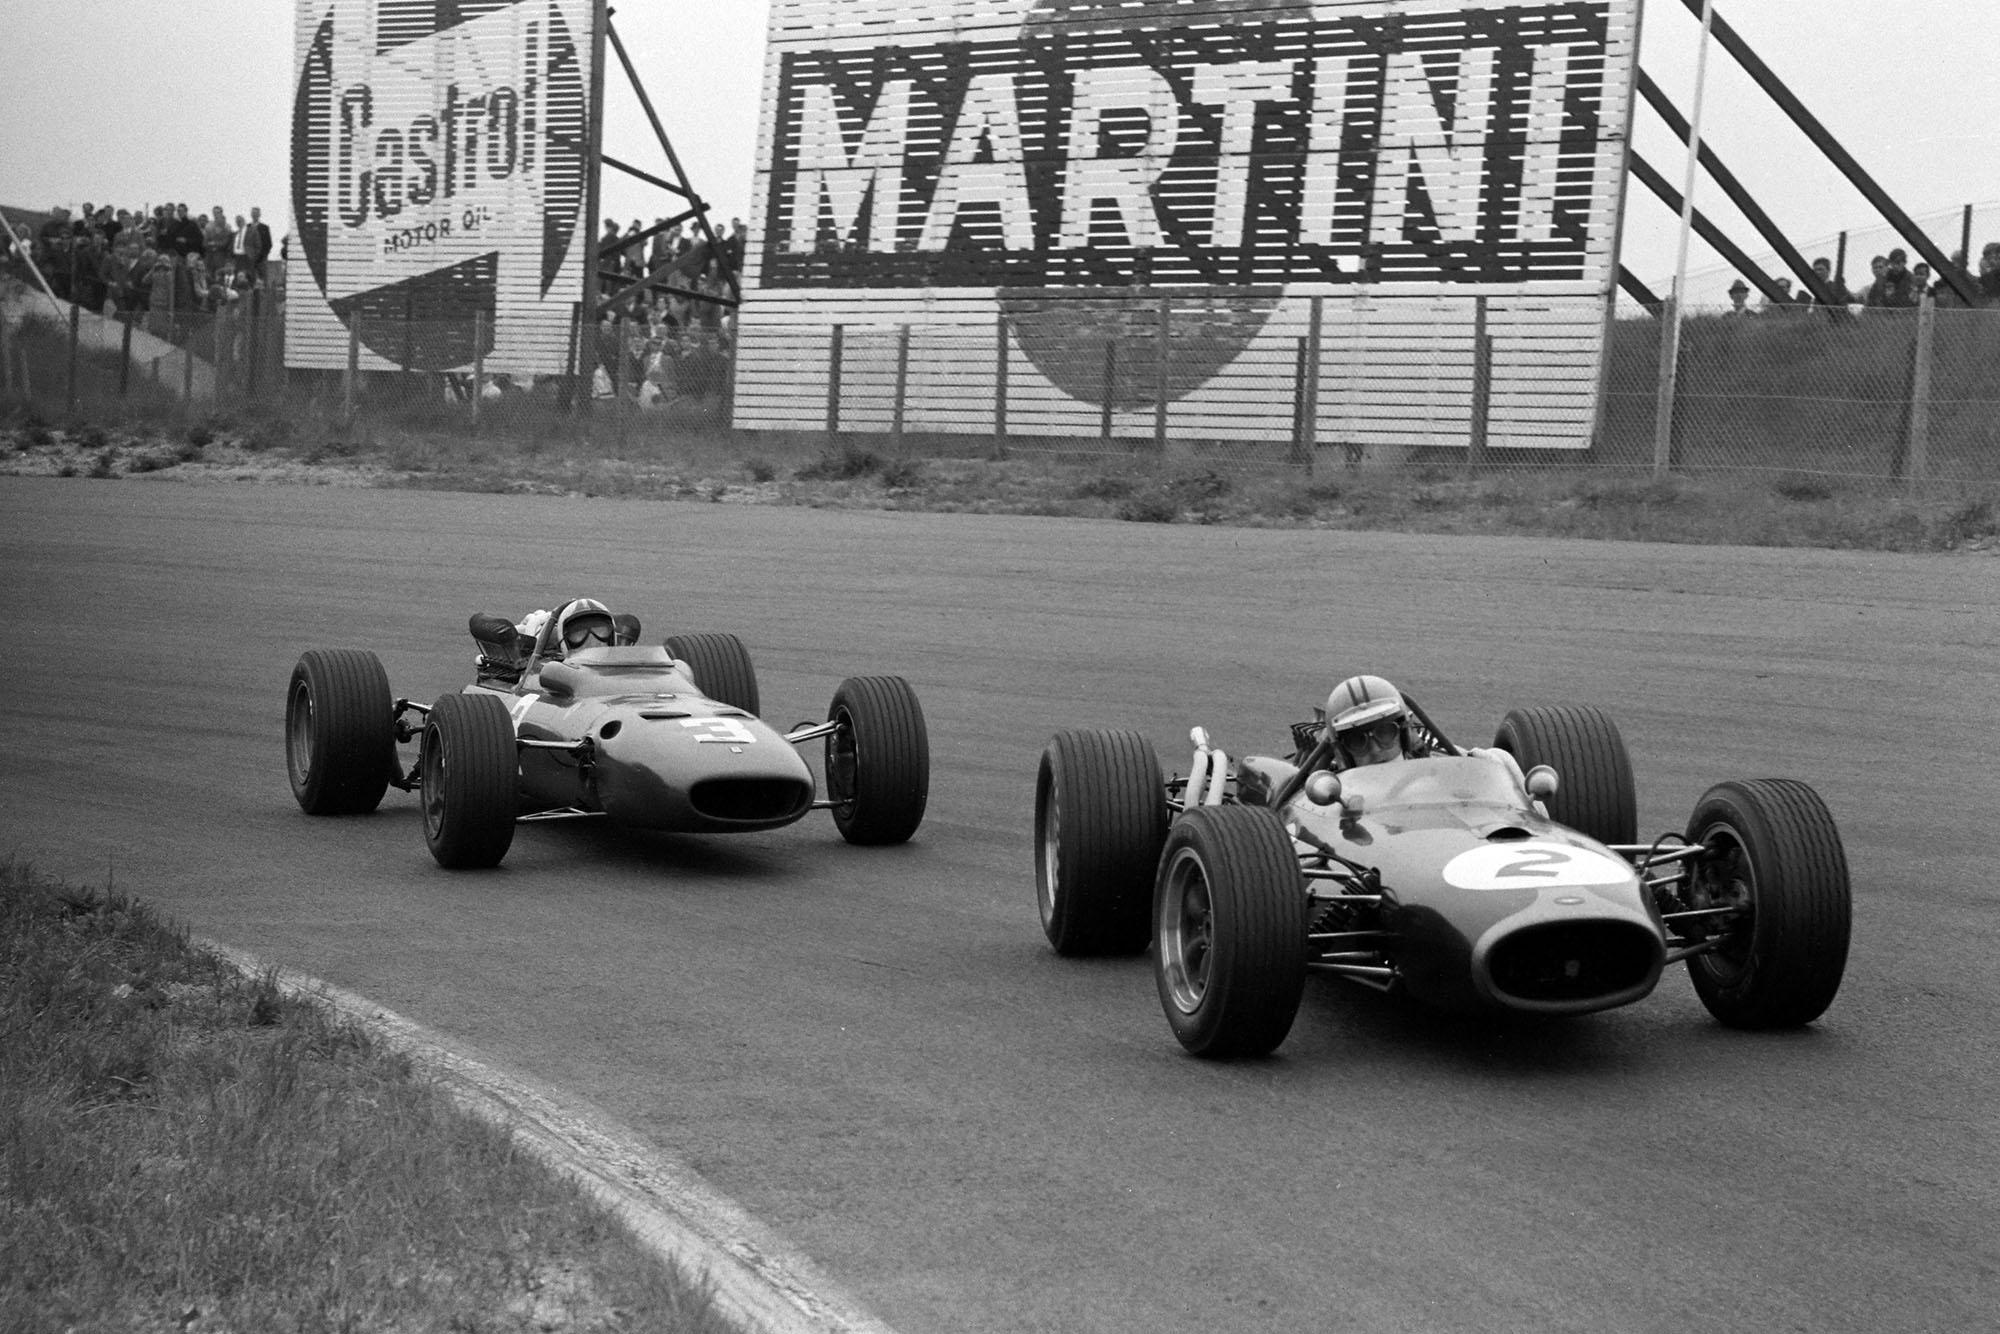 Denny Hulme, Brabham BT20 Repco, leads Chris Amon, Ferrari 312.